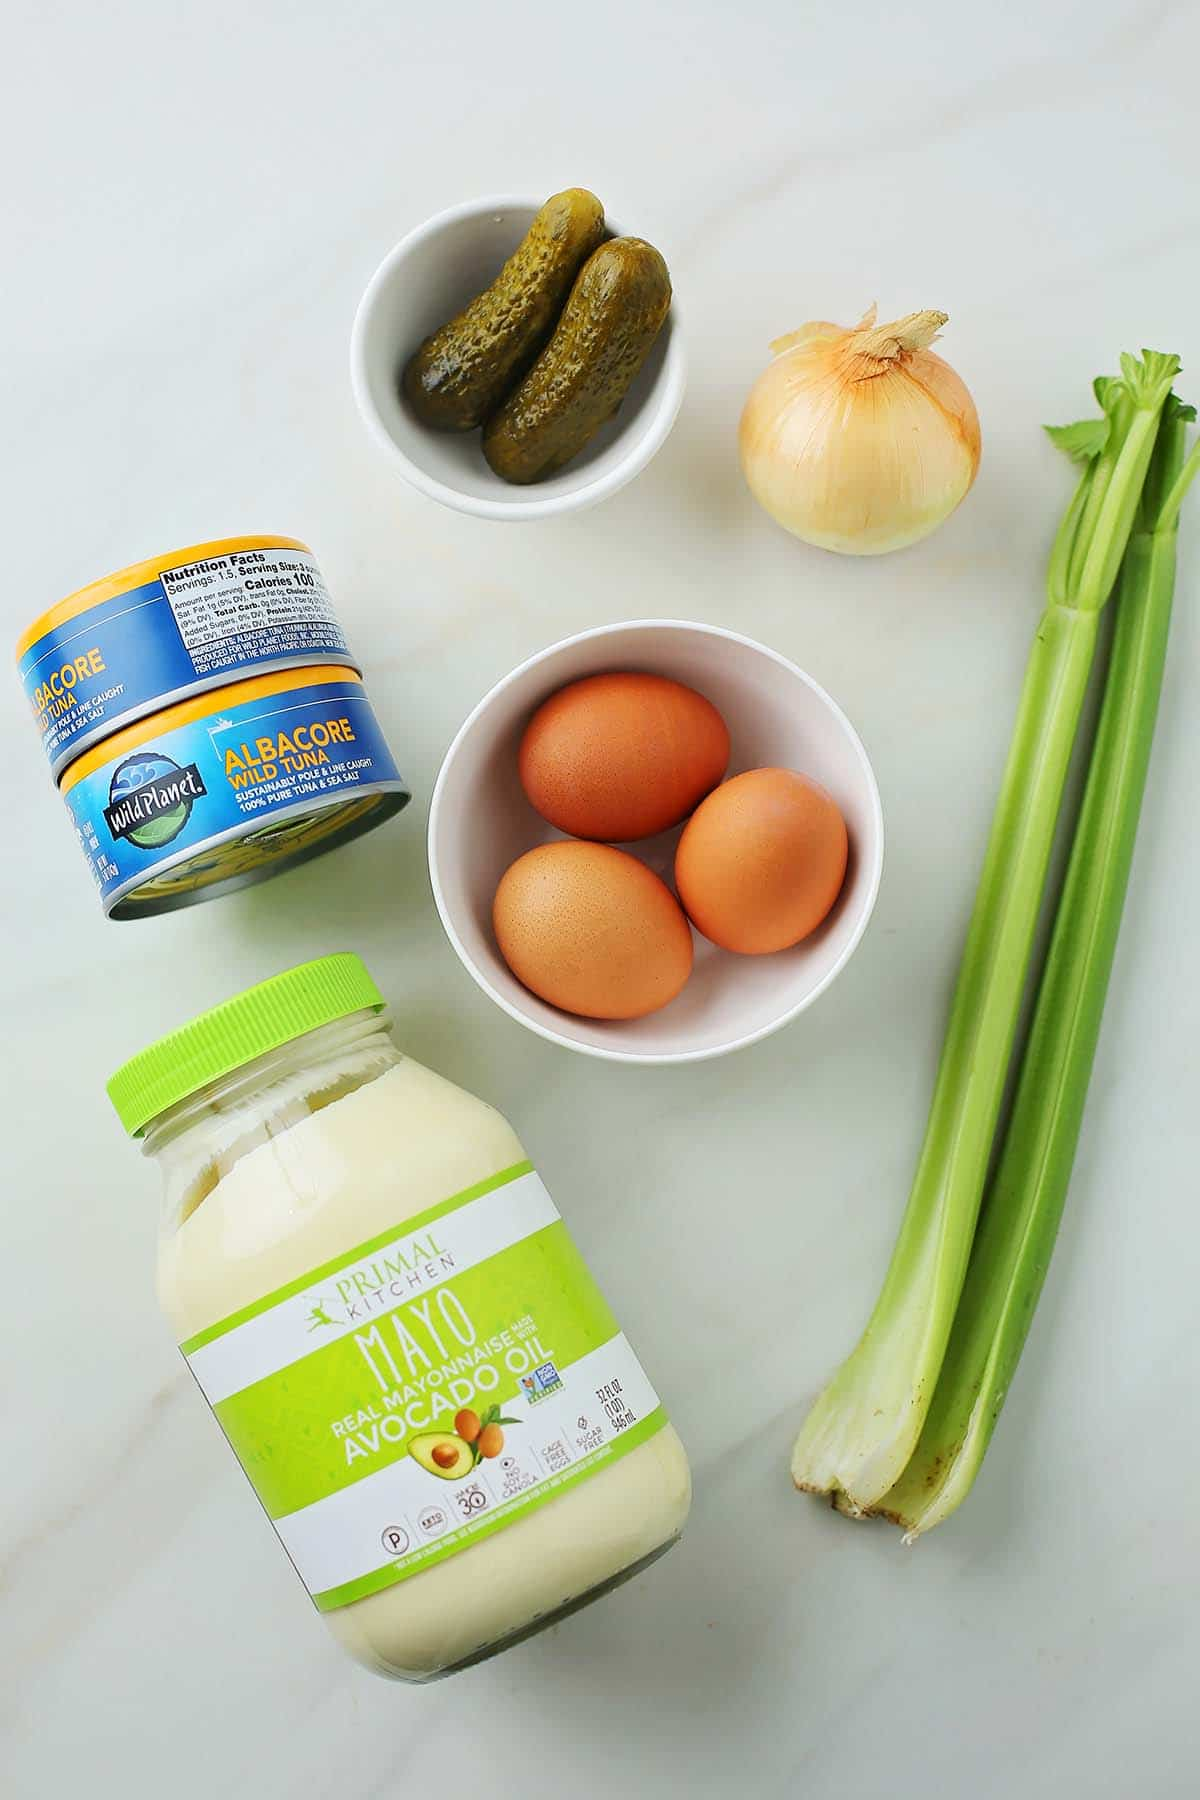 ingredients to make tuna salad